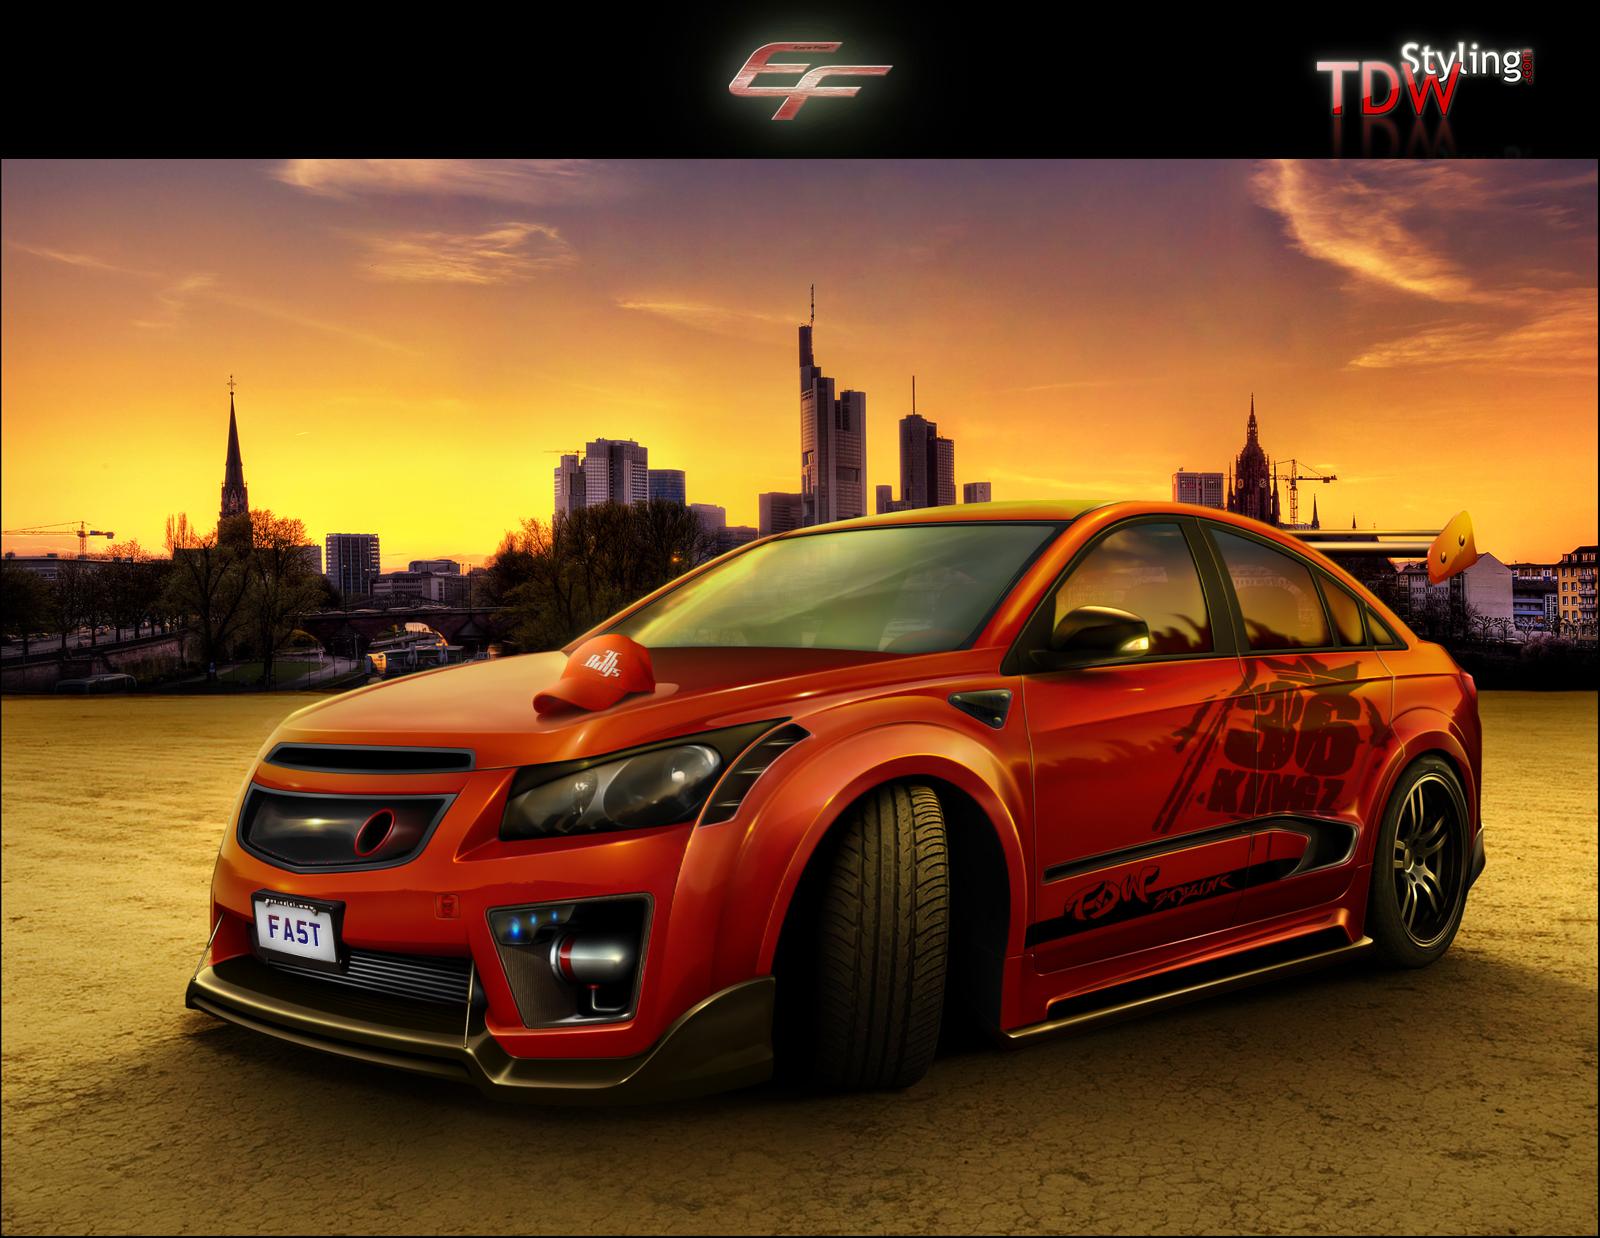 Chevrolet Cruze LS by EmreFast